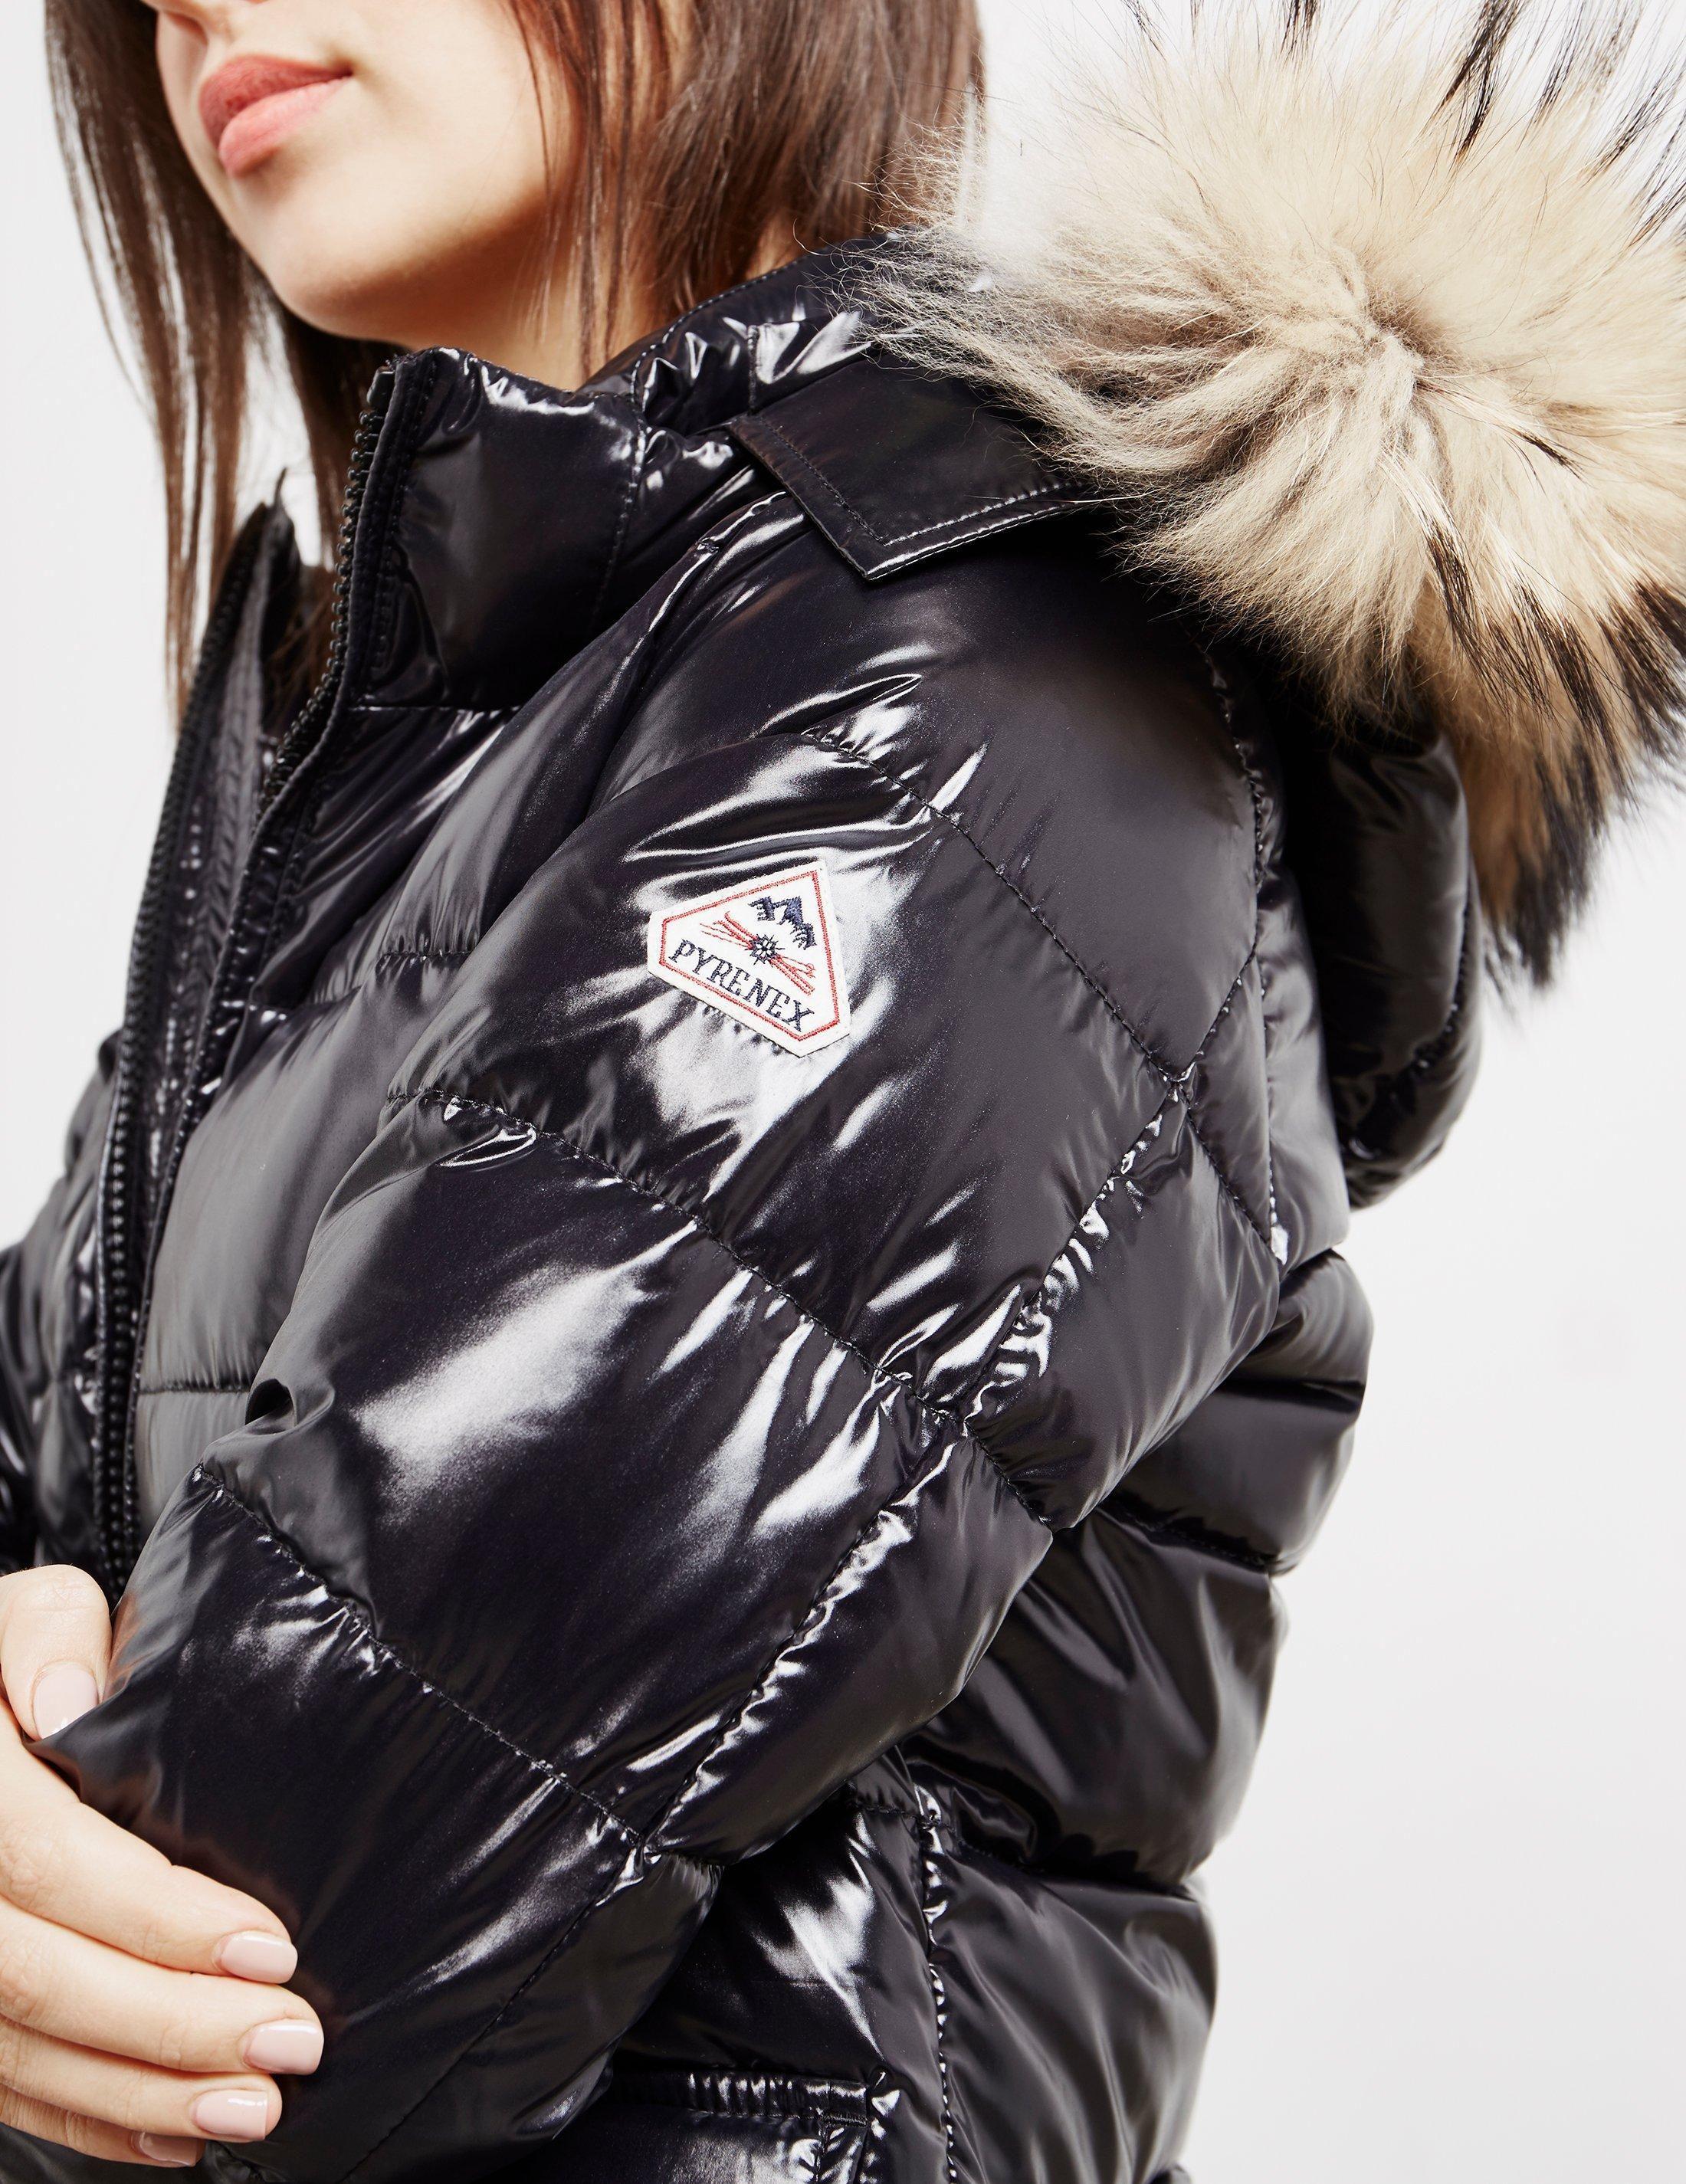 02d37d42e699 Lyst - Pyrenex Womens Authentic Shiny Jacket Black in Black - Save  1.623815967523683%